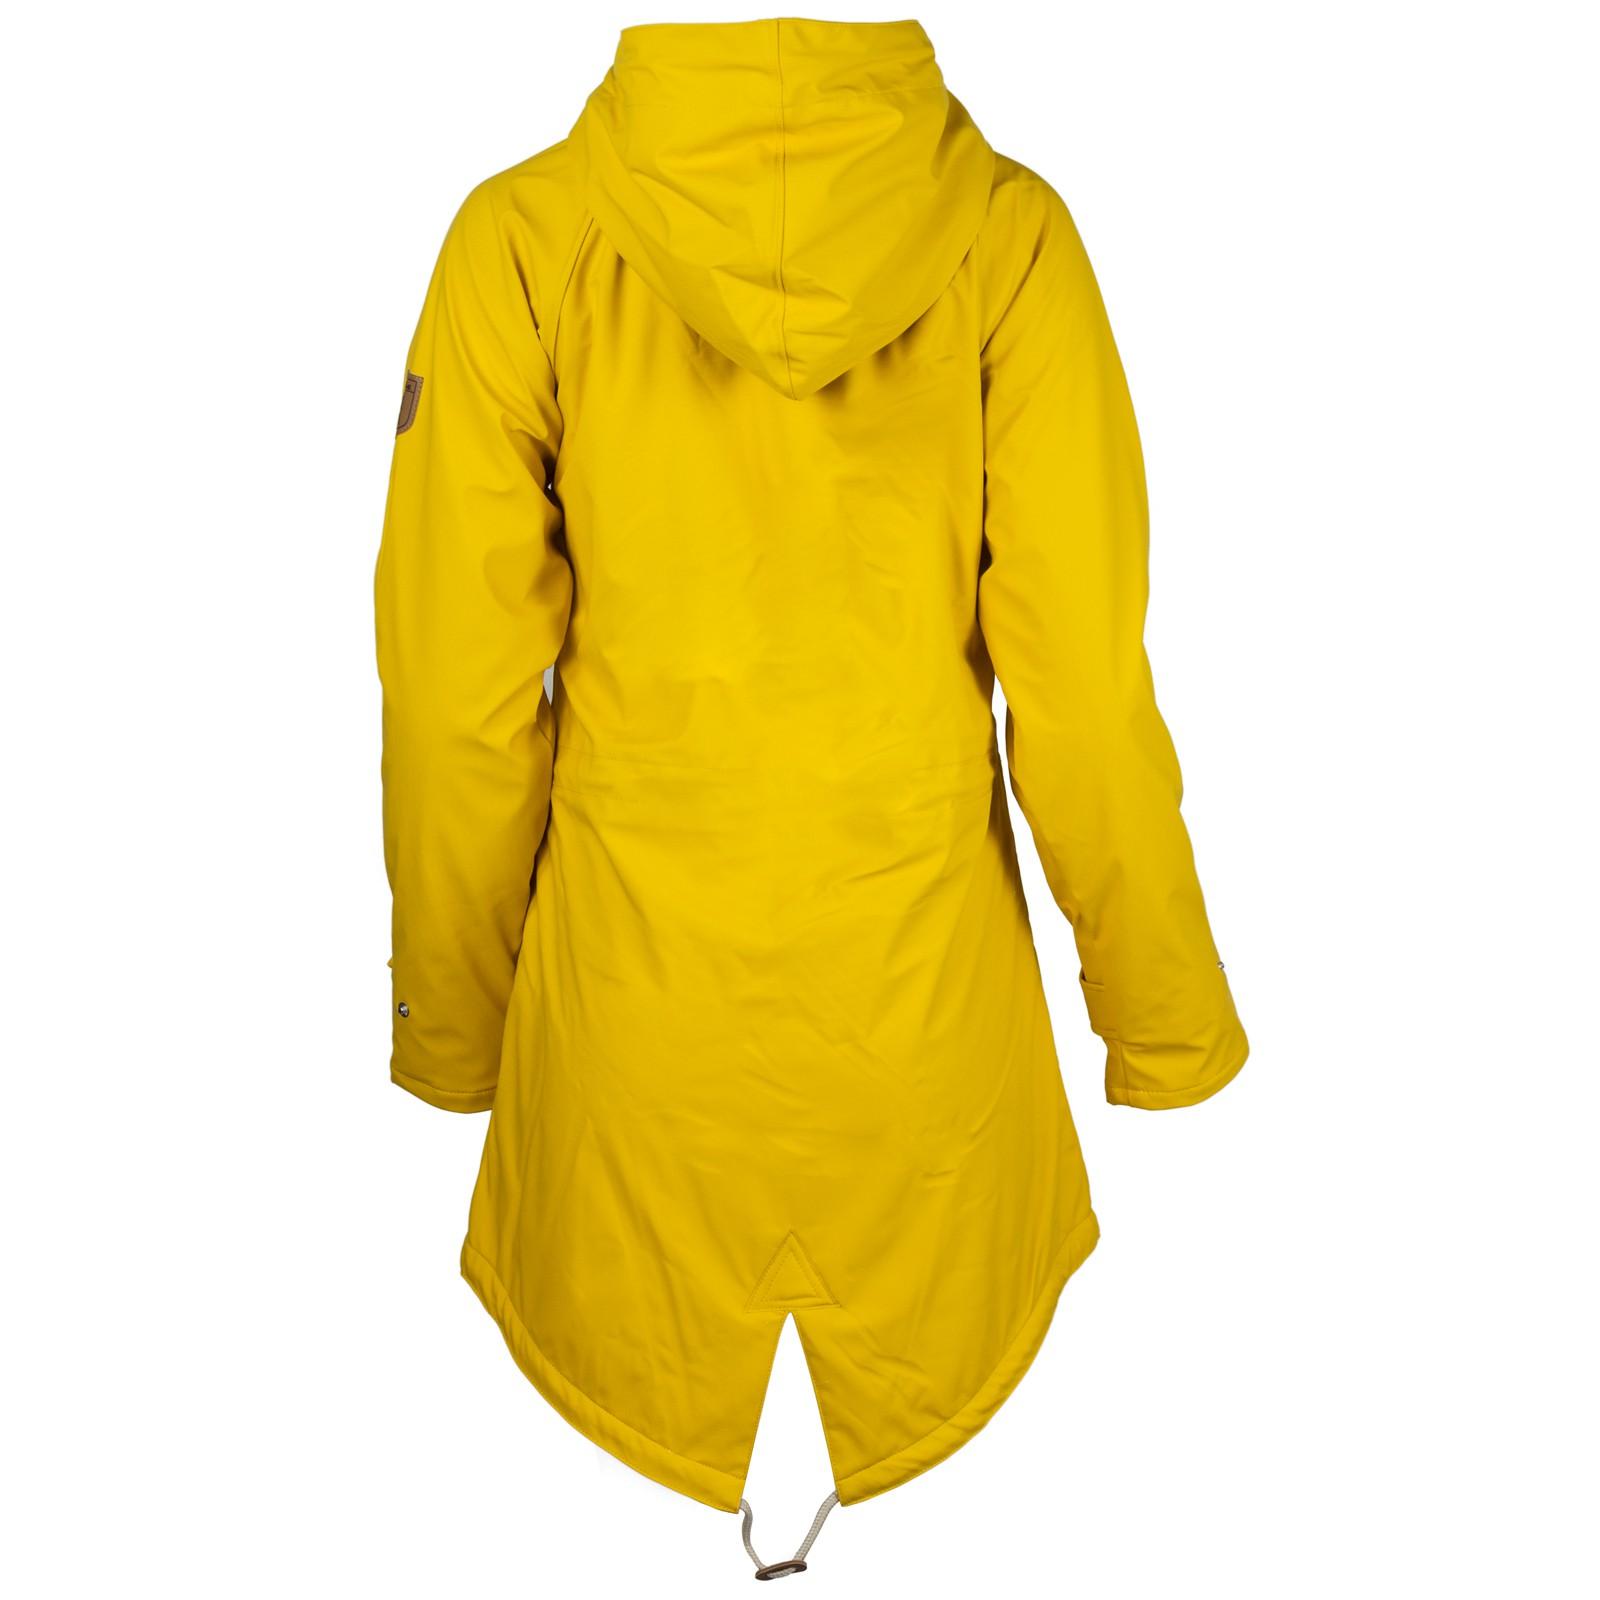 derbe damen regenjacke parka regen mantel wasserabweisend. Black Bedroom Furniture Sets. Home Design Ideas